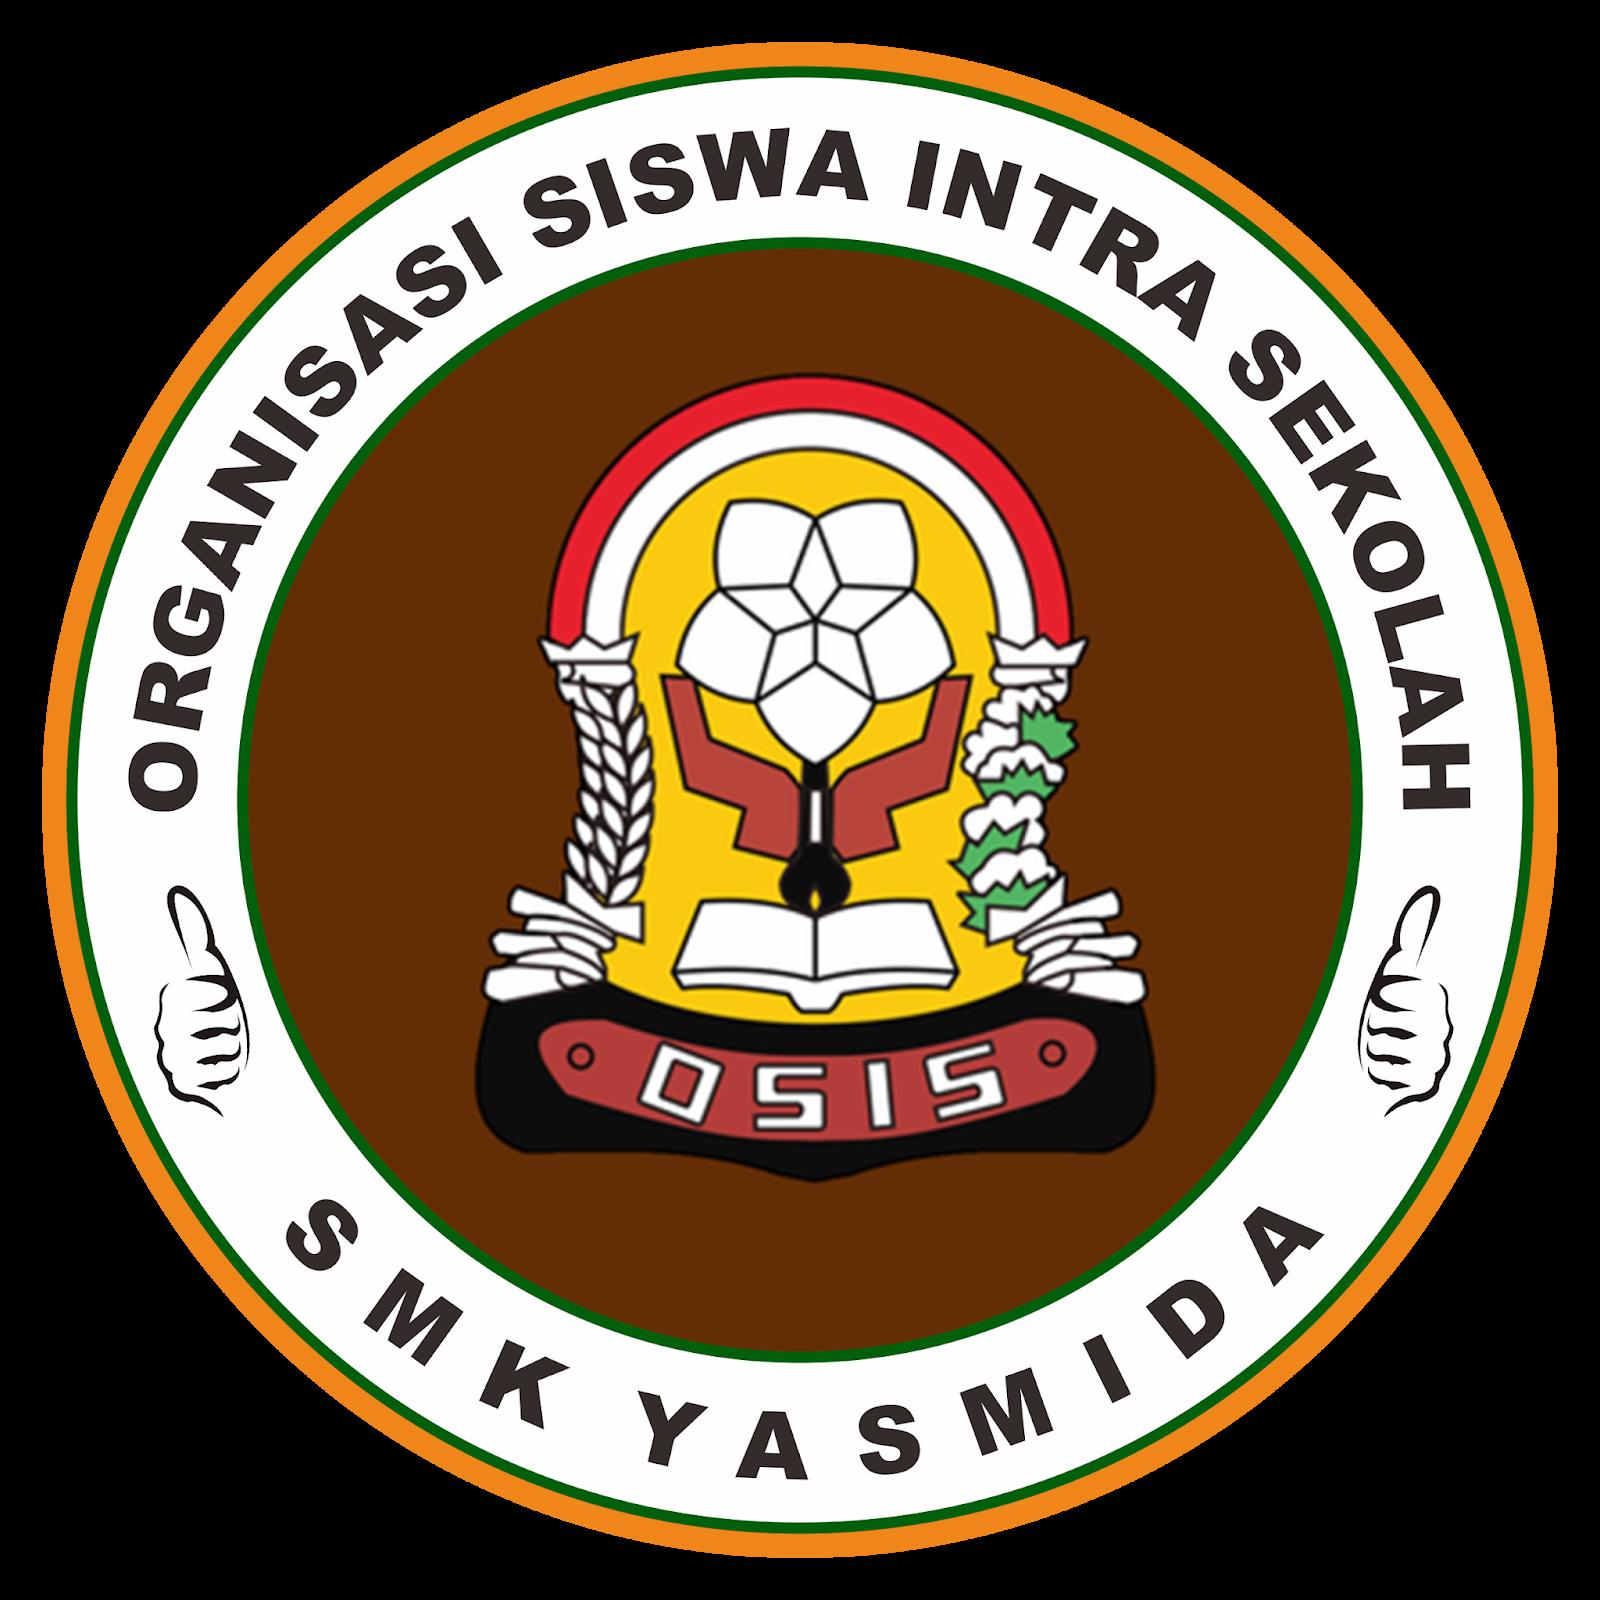 Desain Logo Osis Smk Yasmida Ambarawa Osika Abdur Rozak